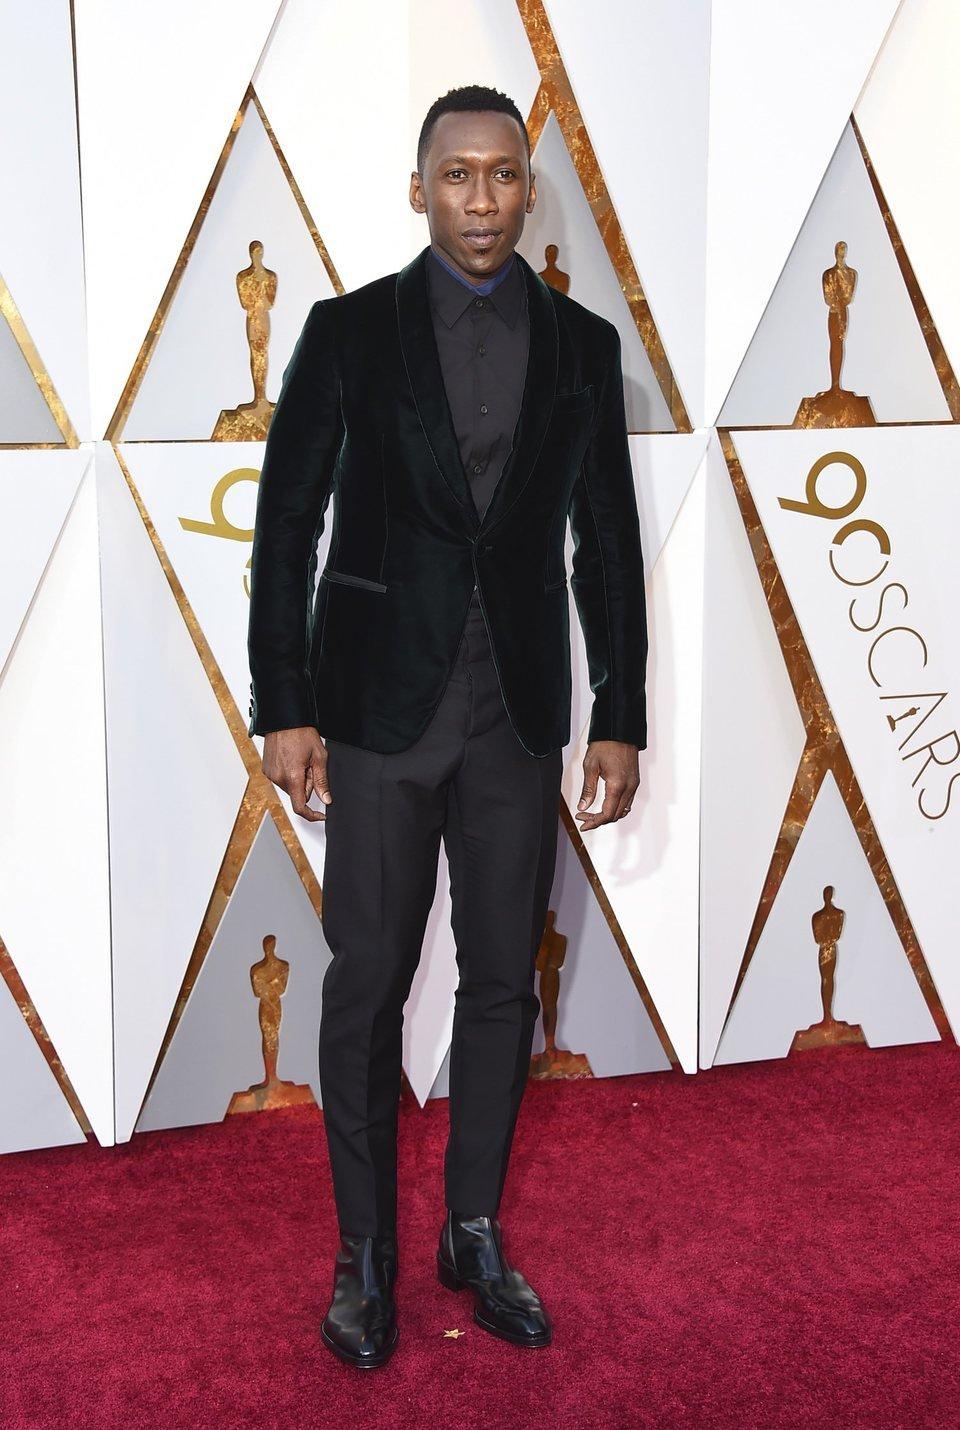 Mahershala Ali at the Oscar 2018 red carpet